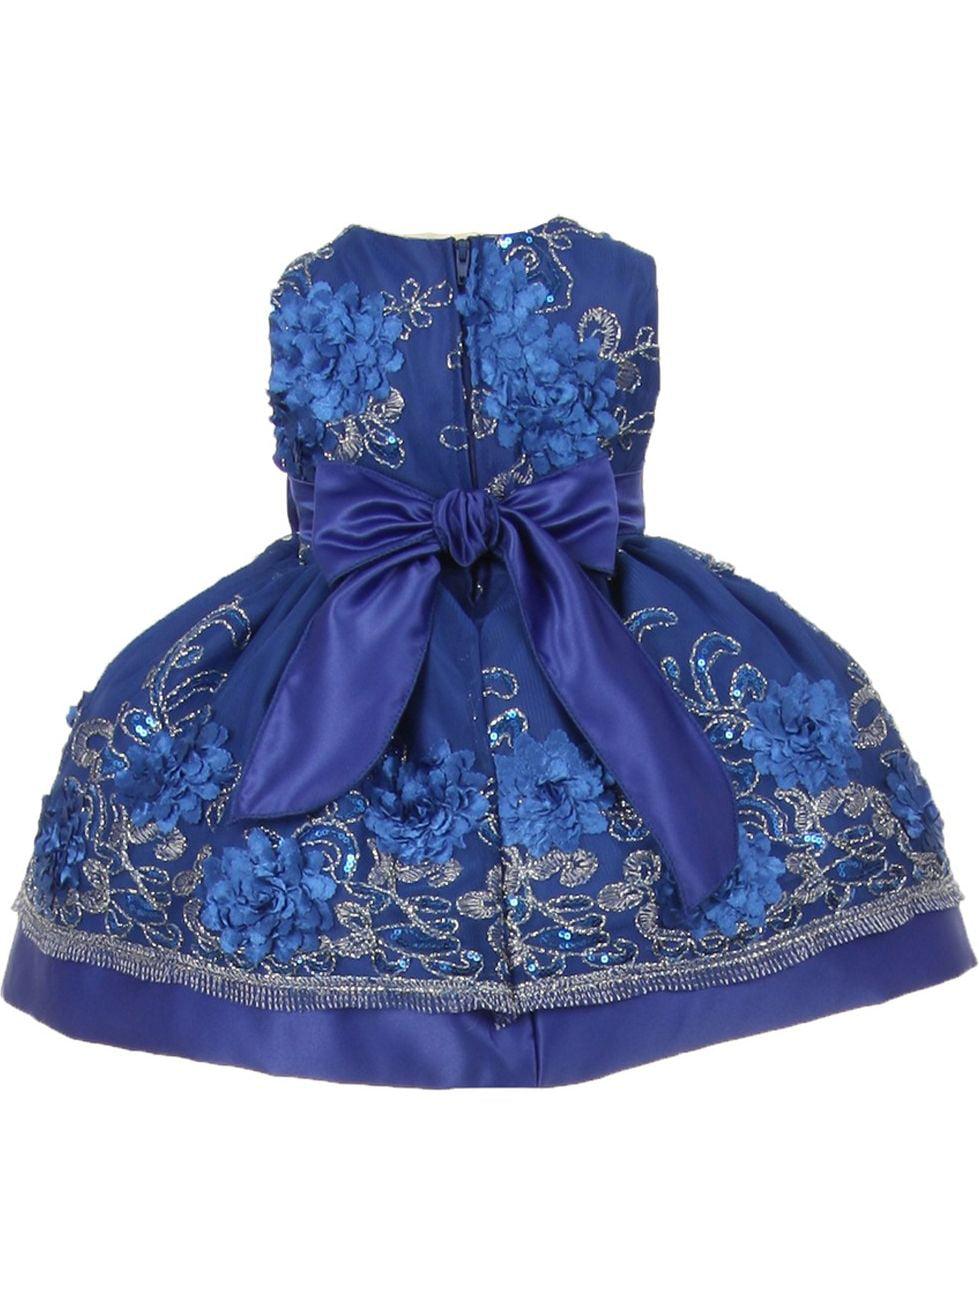 Royal Blue Girls Dresses